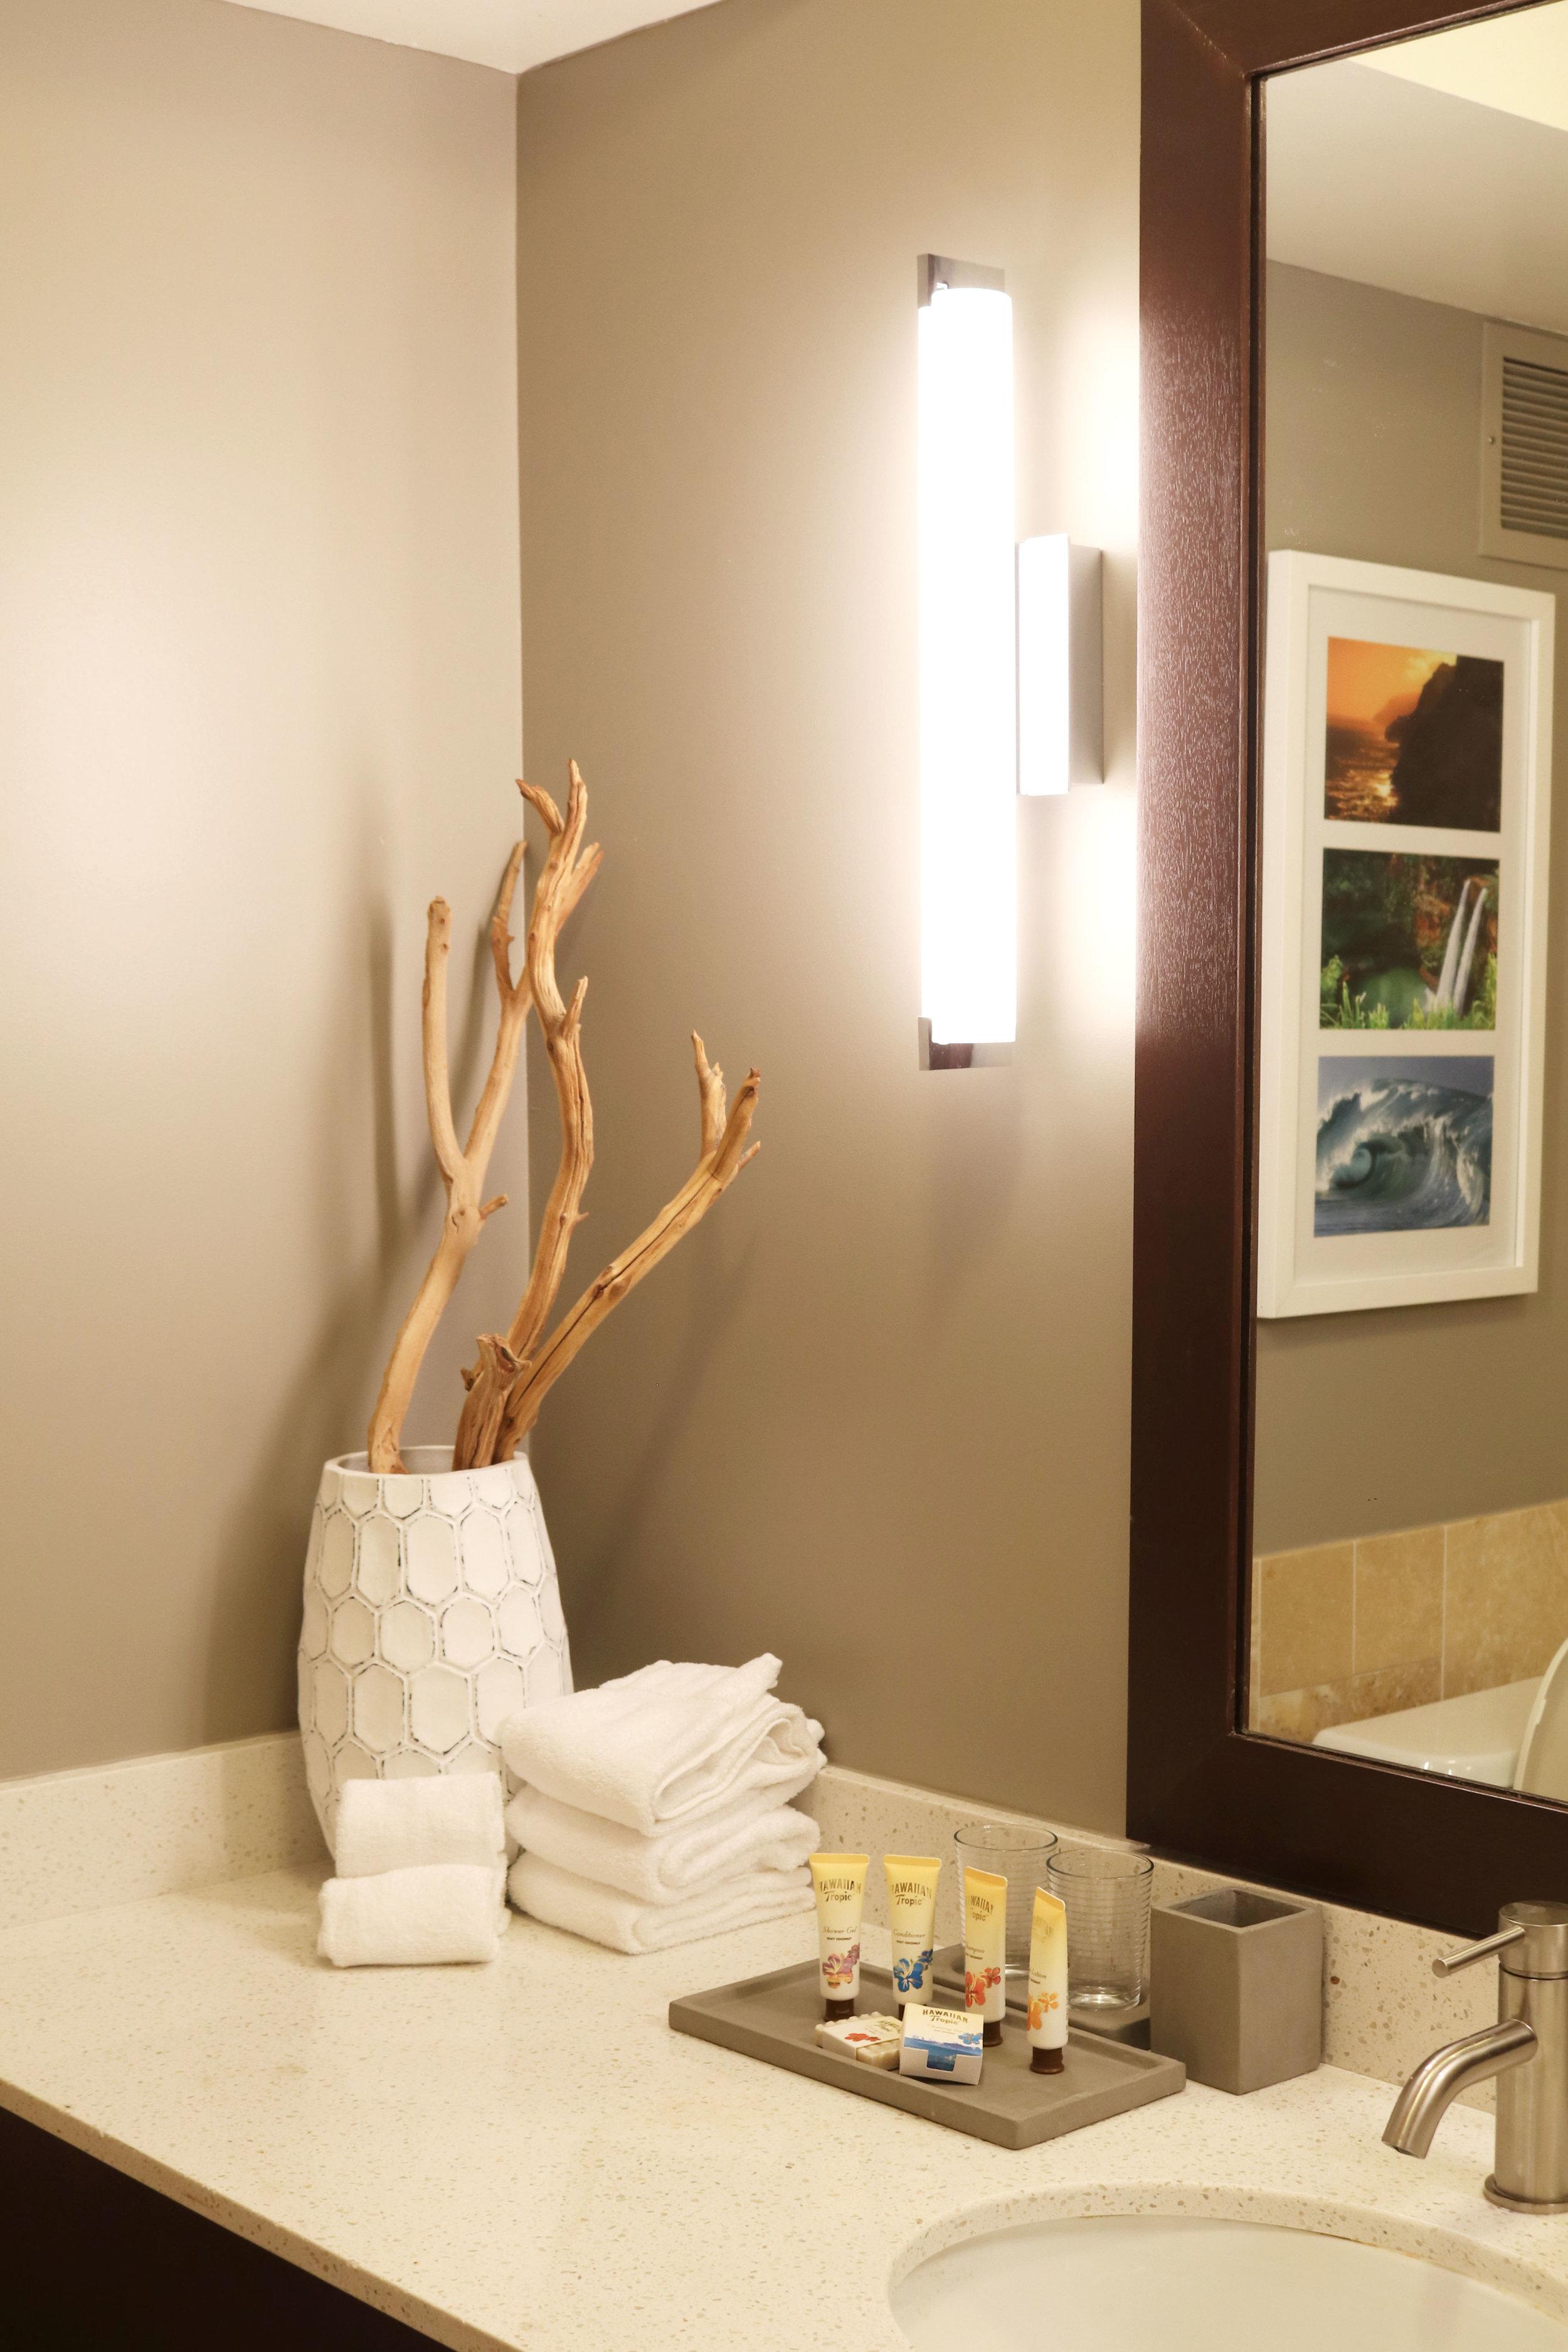 Full bathroom in the hotel room.